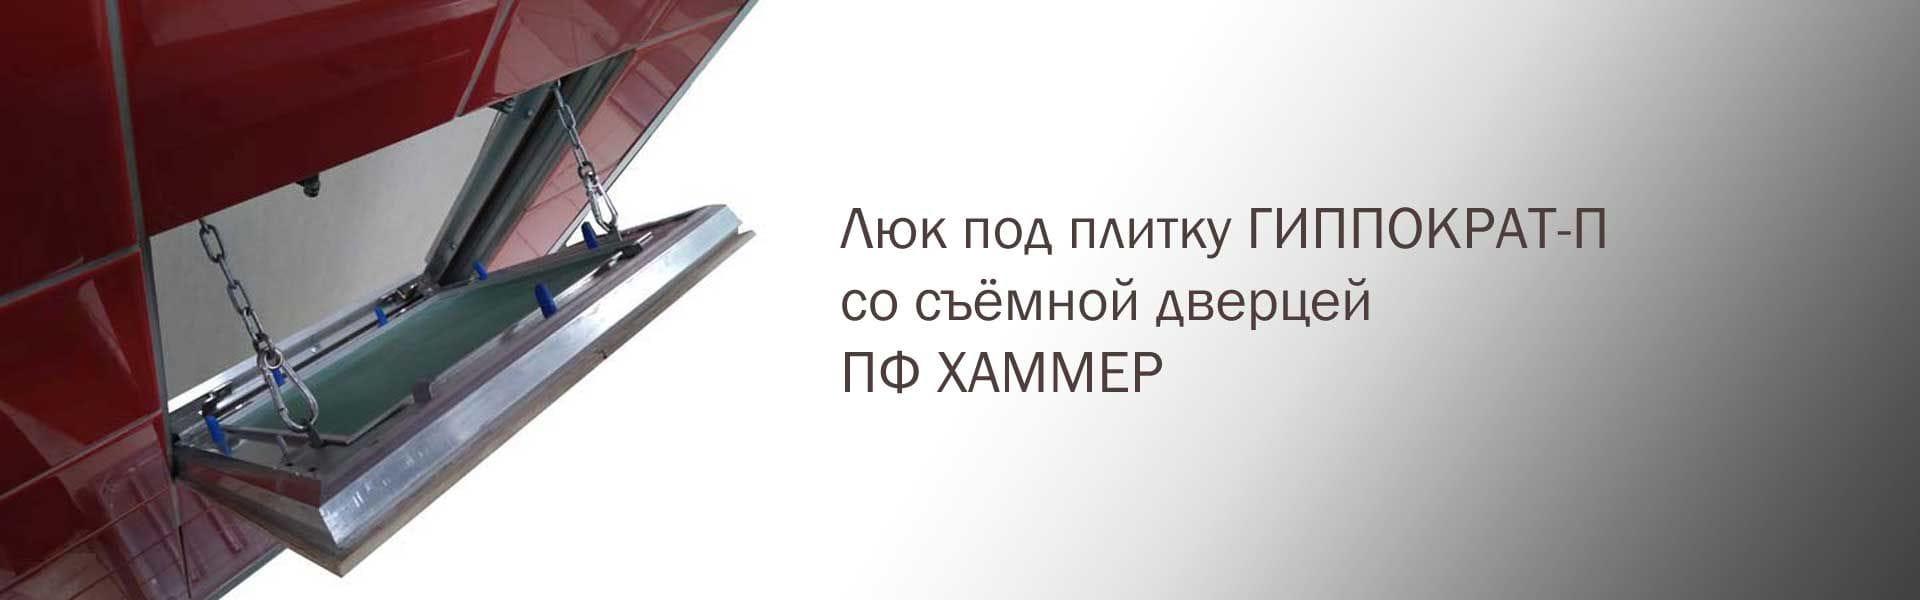 гиппократ-п